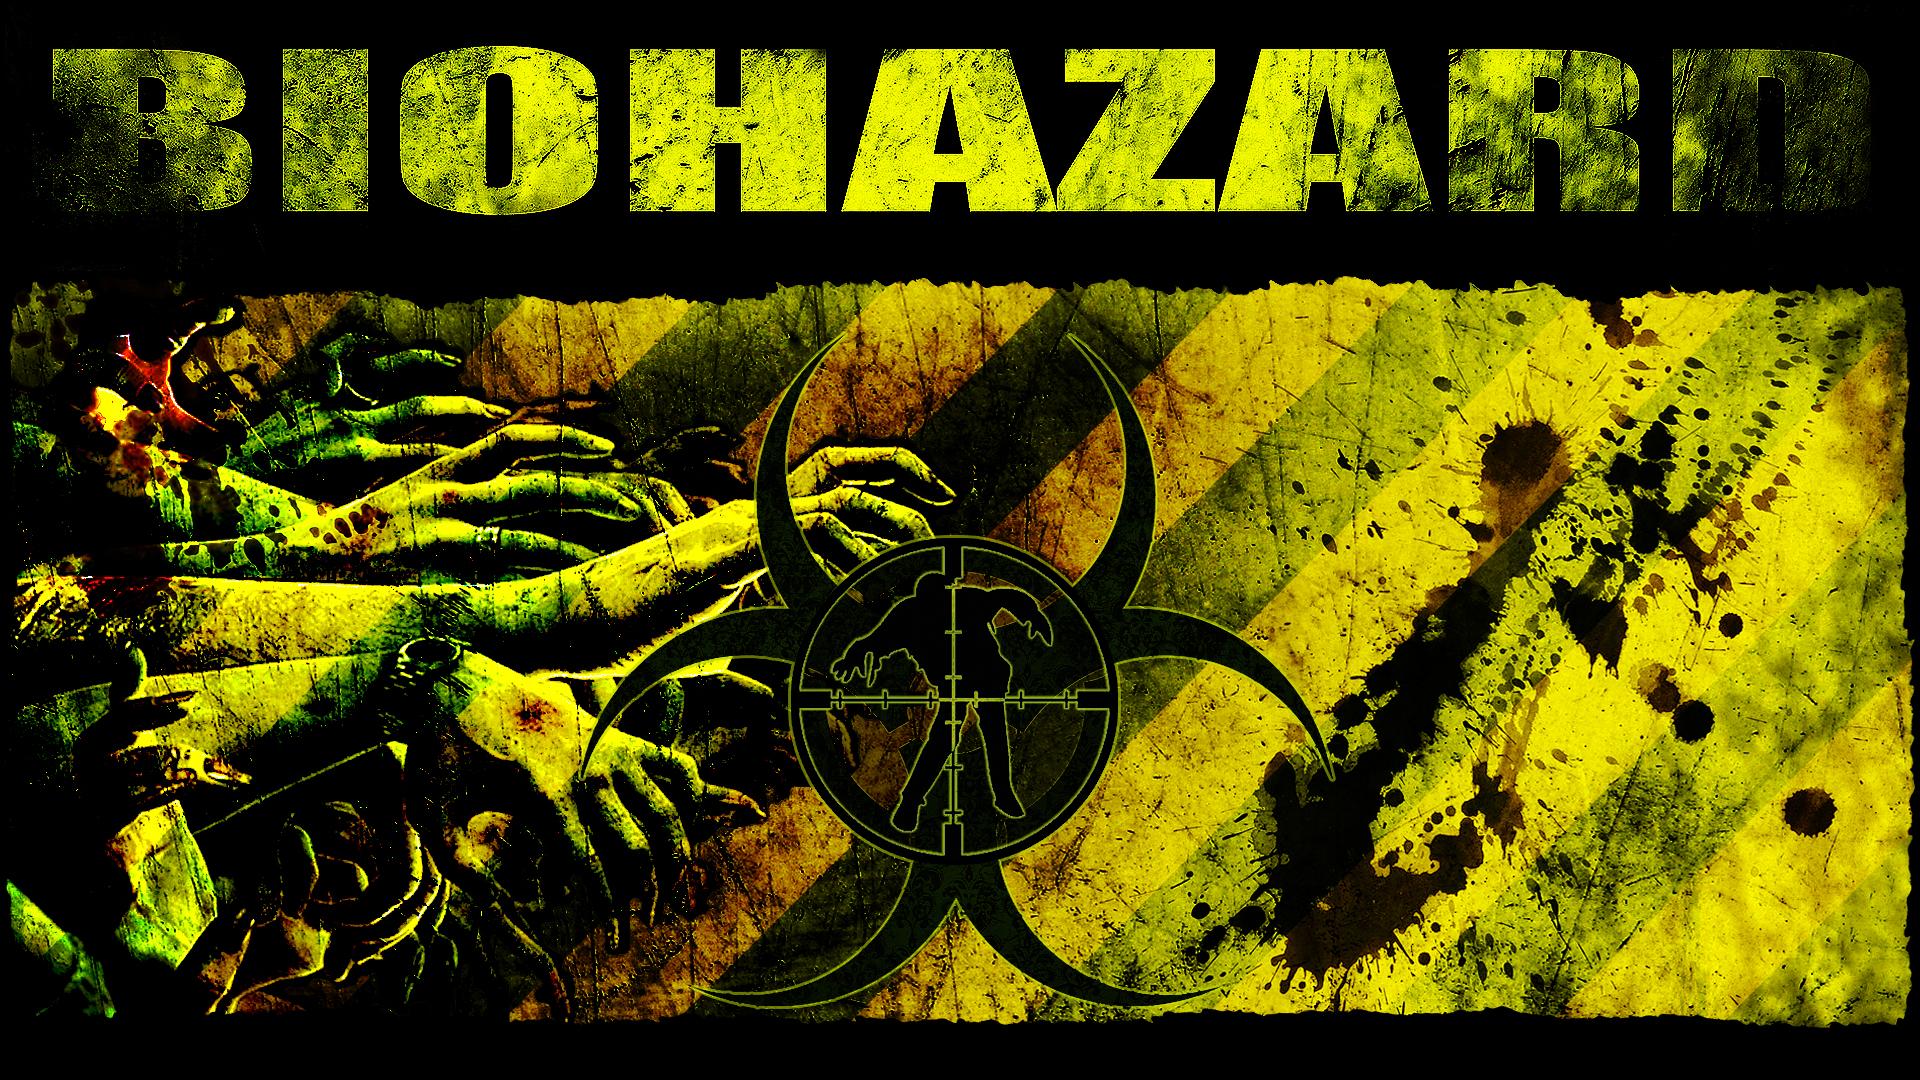 zombie hunter biohazard wallpaper by cru the dwarf on